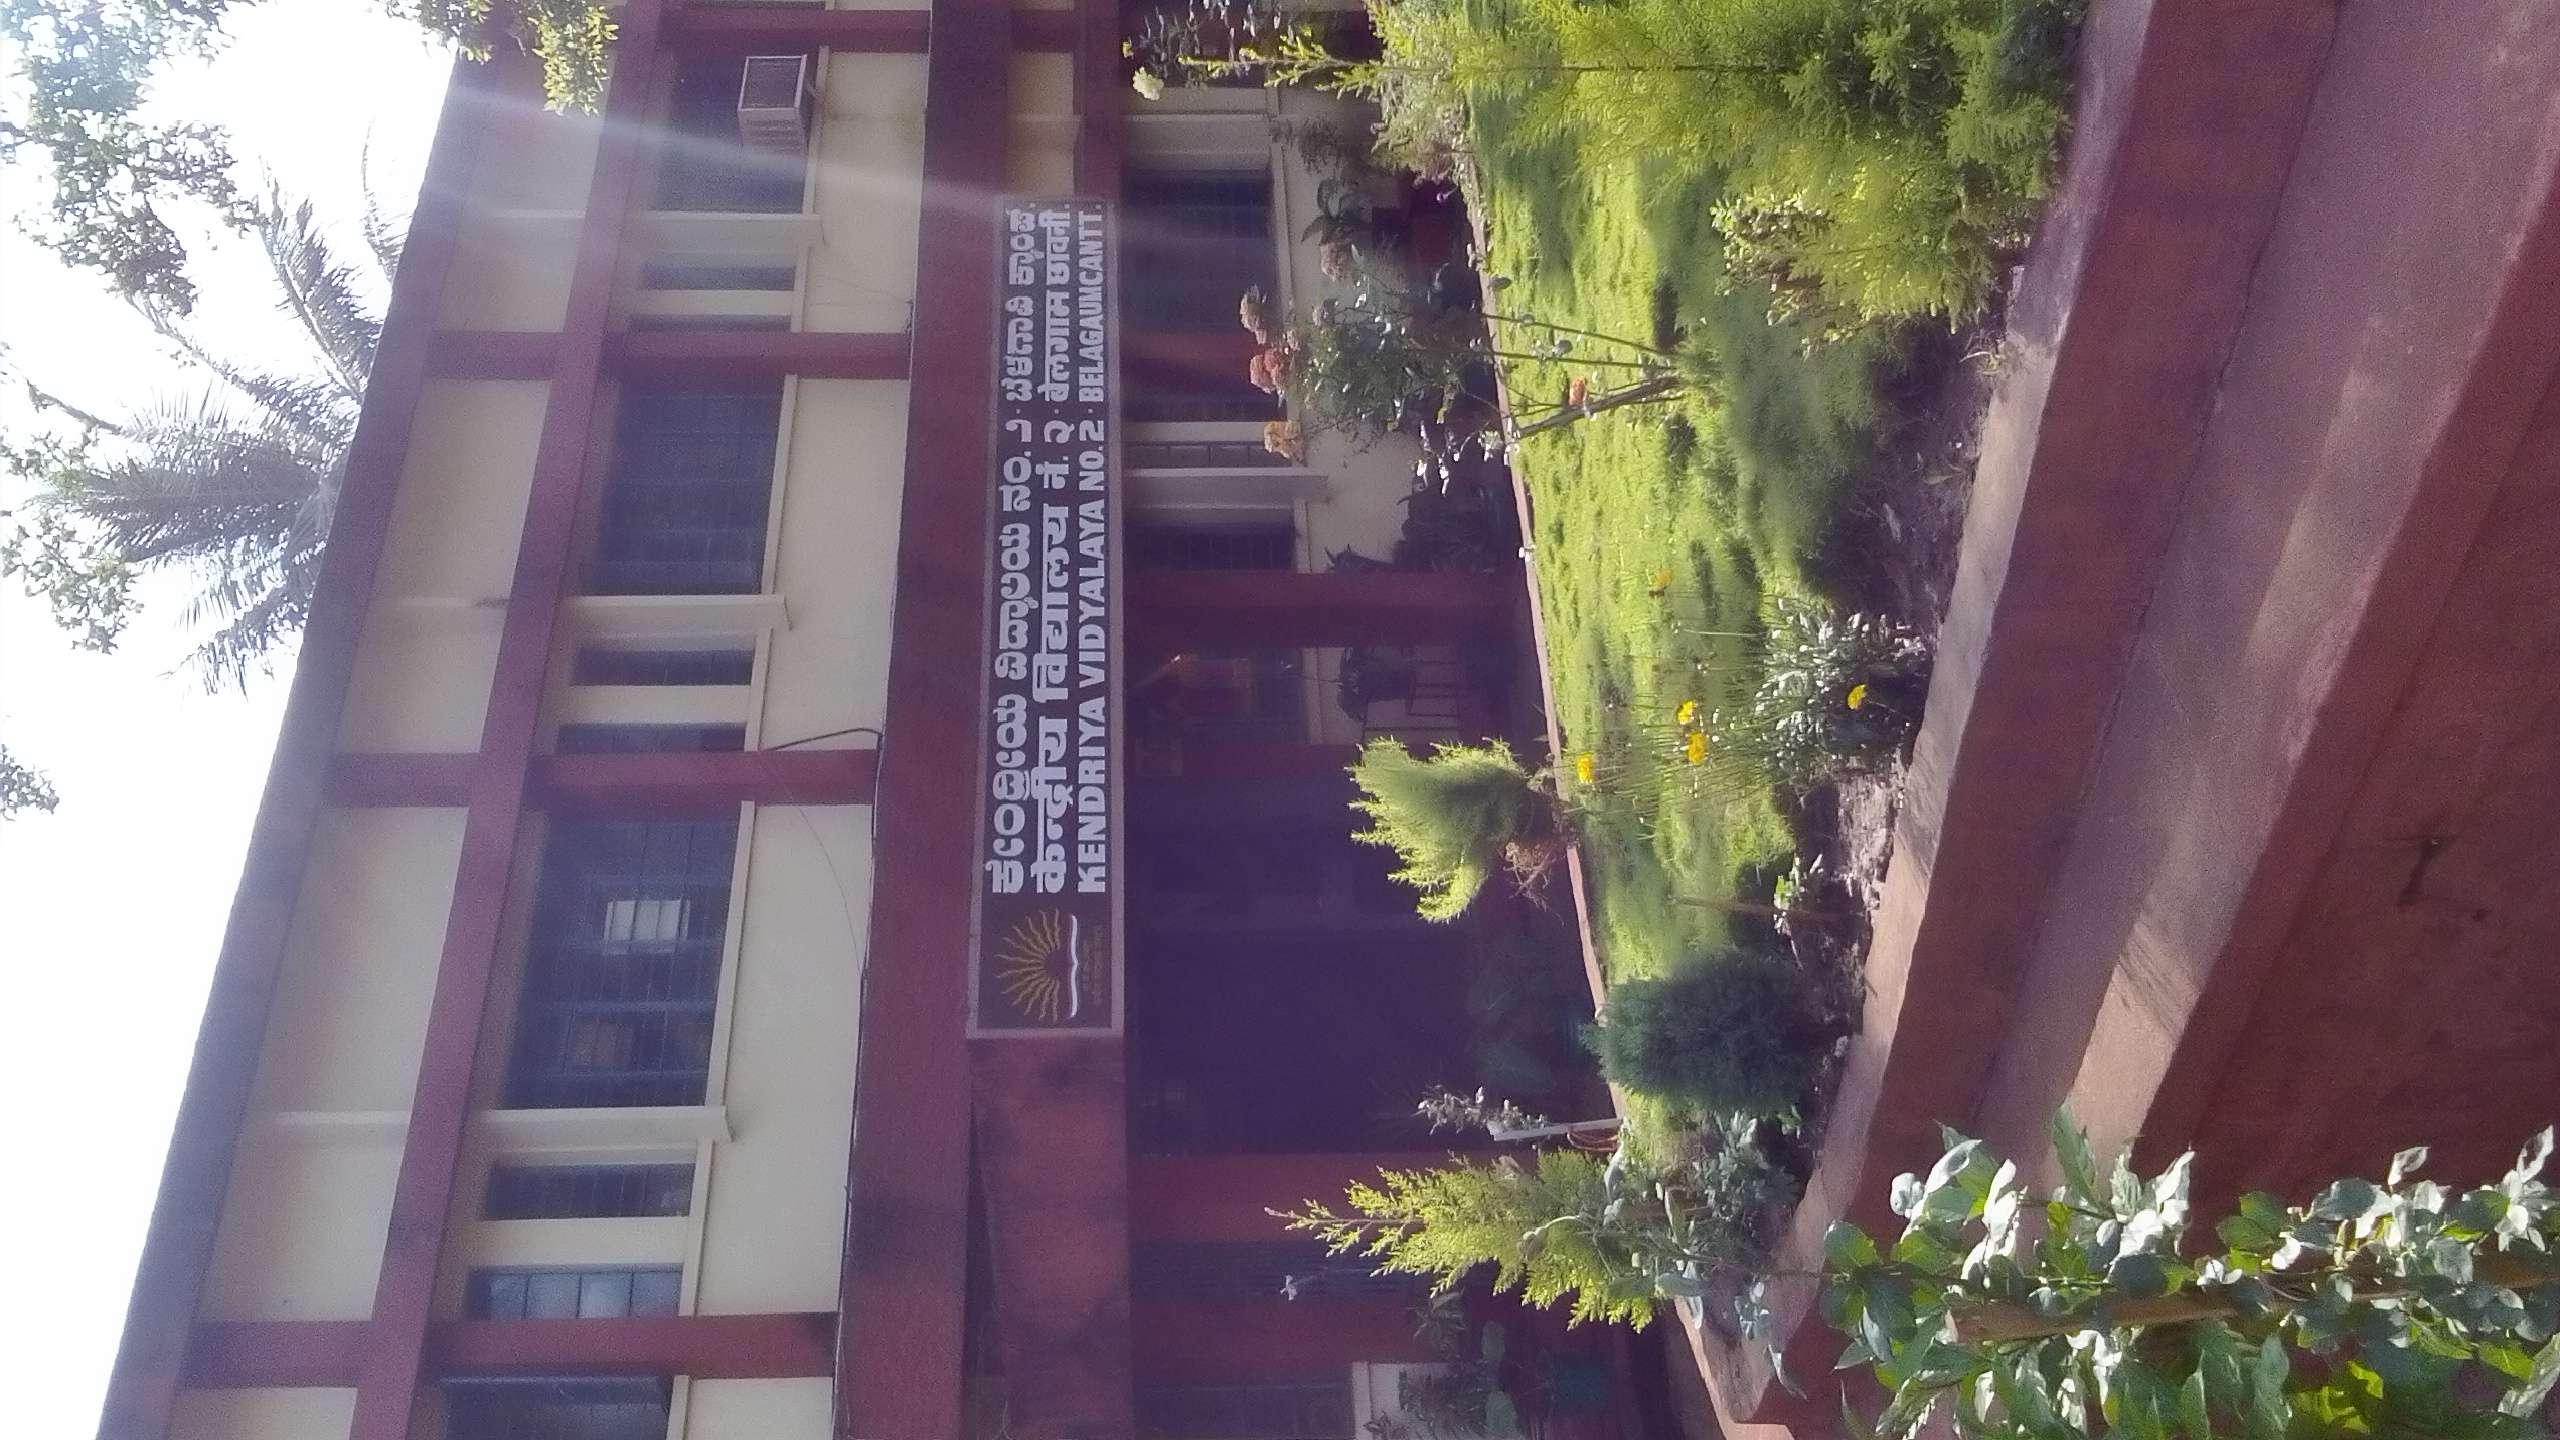 KENDRIYA VIDYALAYA NO 2 MILITARY HOSPITAL ROAD CANTONMENT BELGAUM KARNATAKA 800017